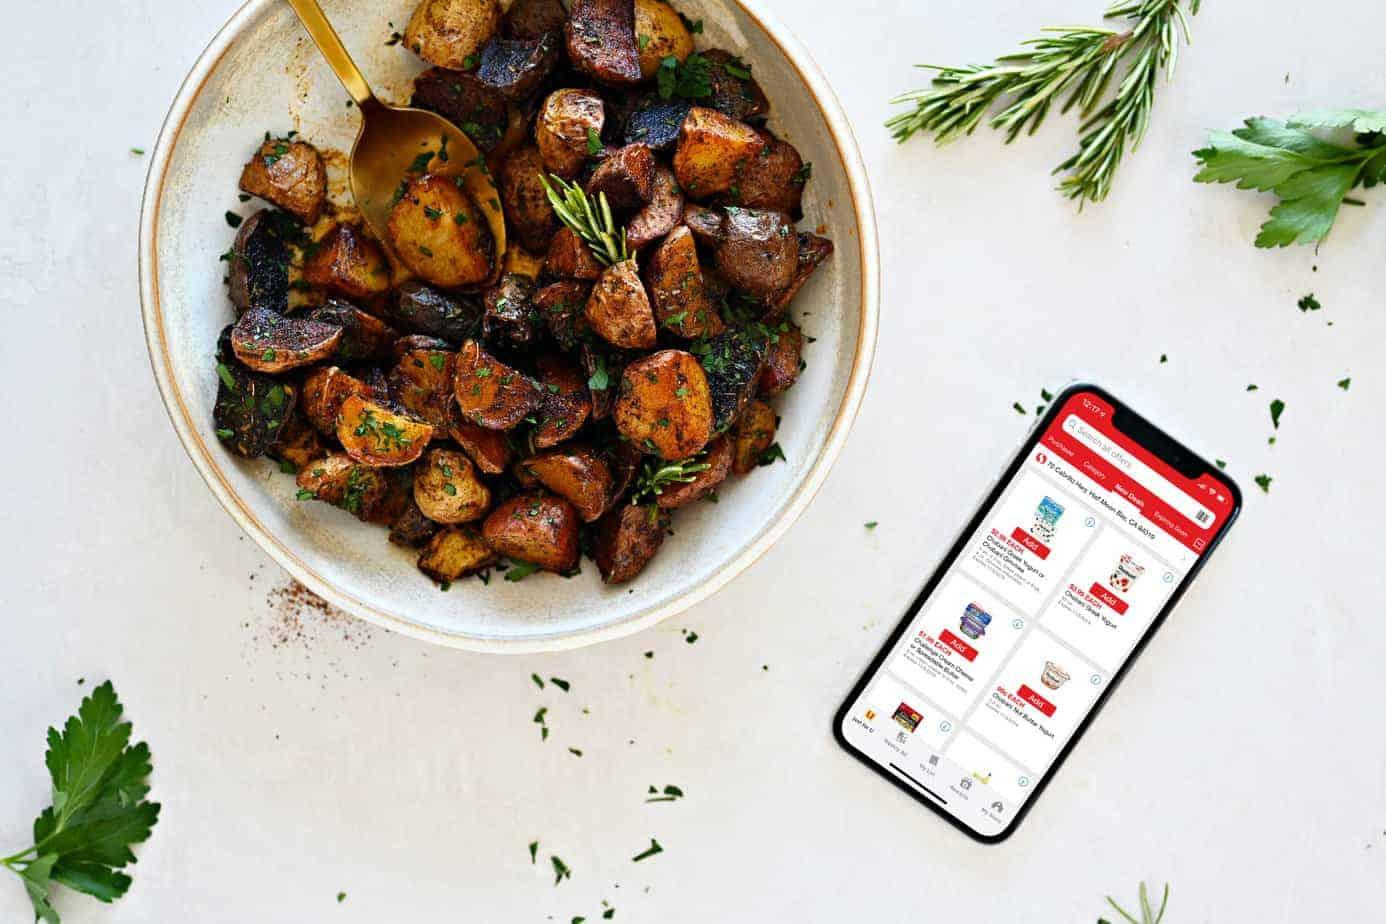 Chili Butter Braised Crispy Pan Roasted Potatoes recipe (via thepigandquill) #holidayrecipe #thanksgiving #dinner #glutenfree #vegetarian